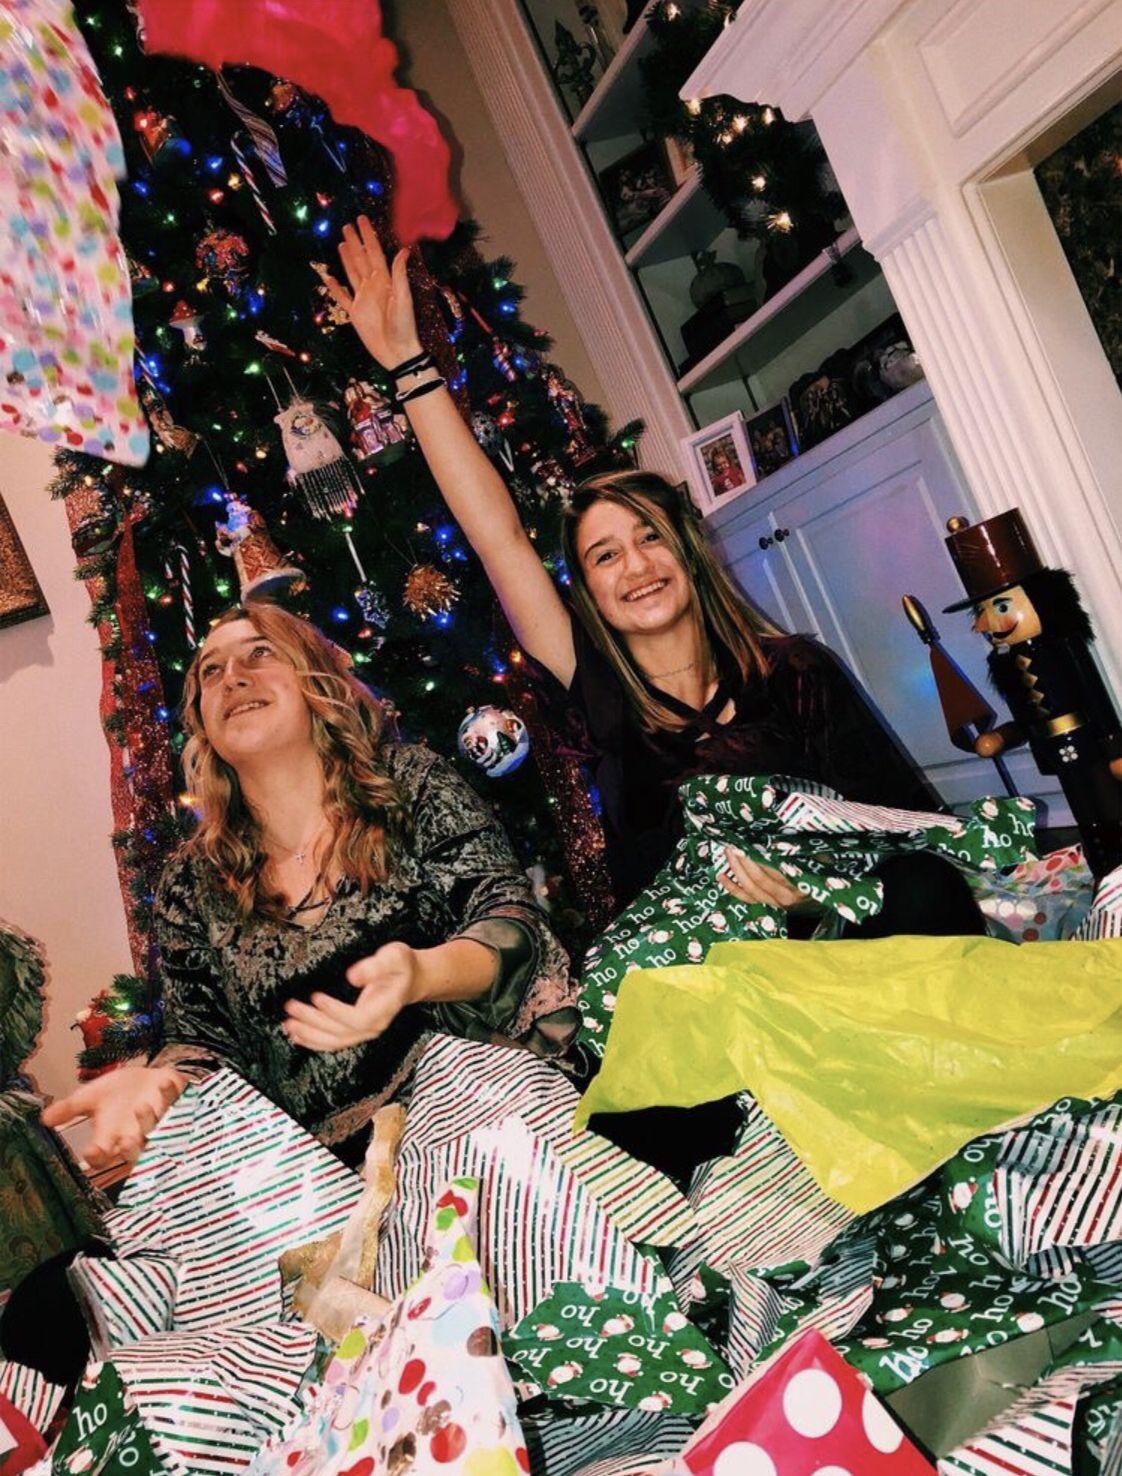 Pinterest Carolinefaith417 With Images Christmas Photoshoot Christmas Aesthetic Cozy Christmas